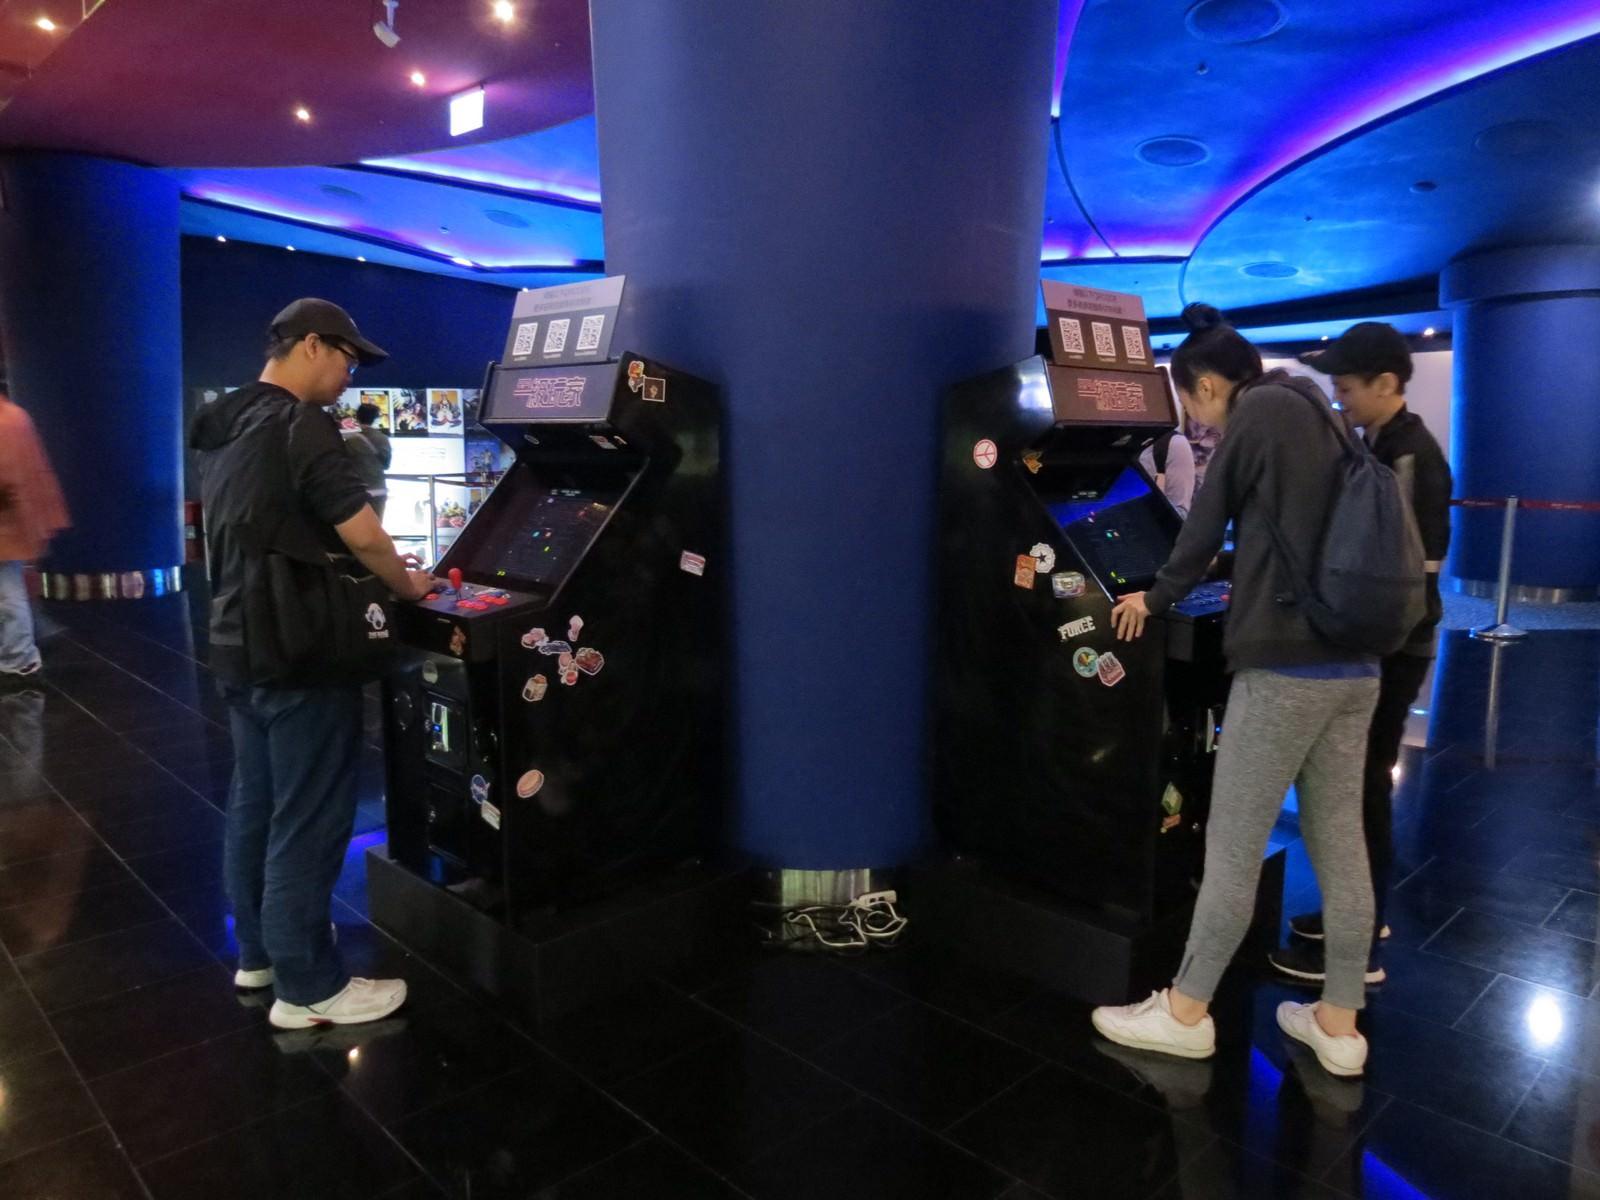 Movie, Ready Player One(美國) / 一級玩家(台) / 头号玩家(中) / 挑戰者1號(港), 廣告看板, 美麗華